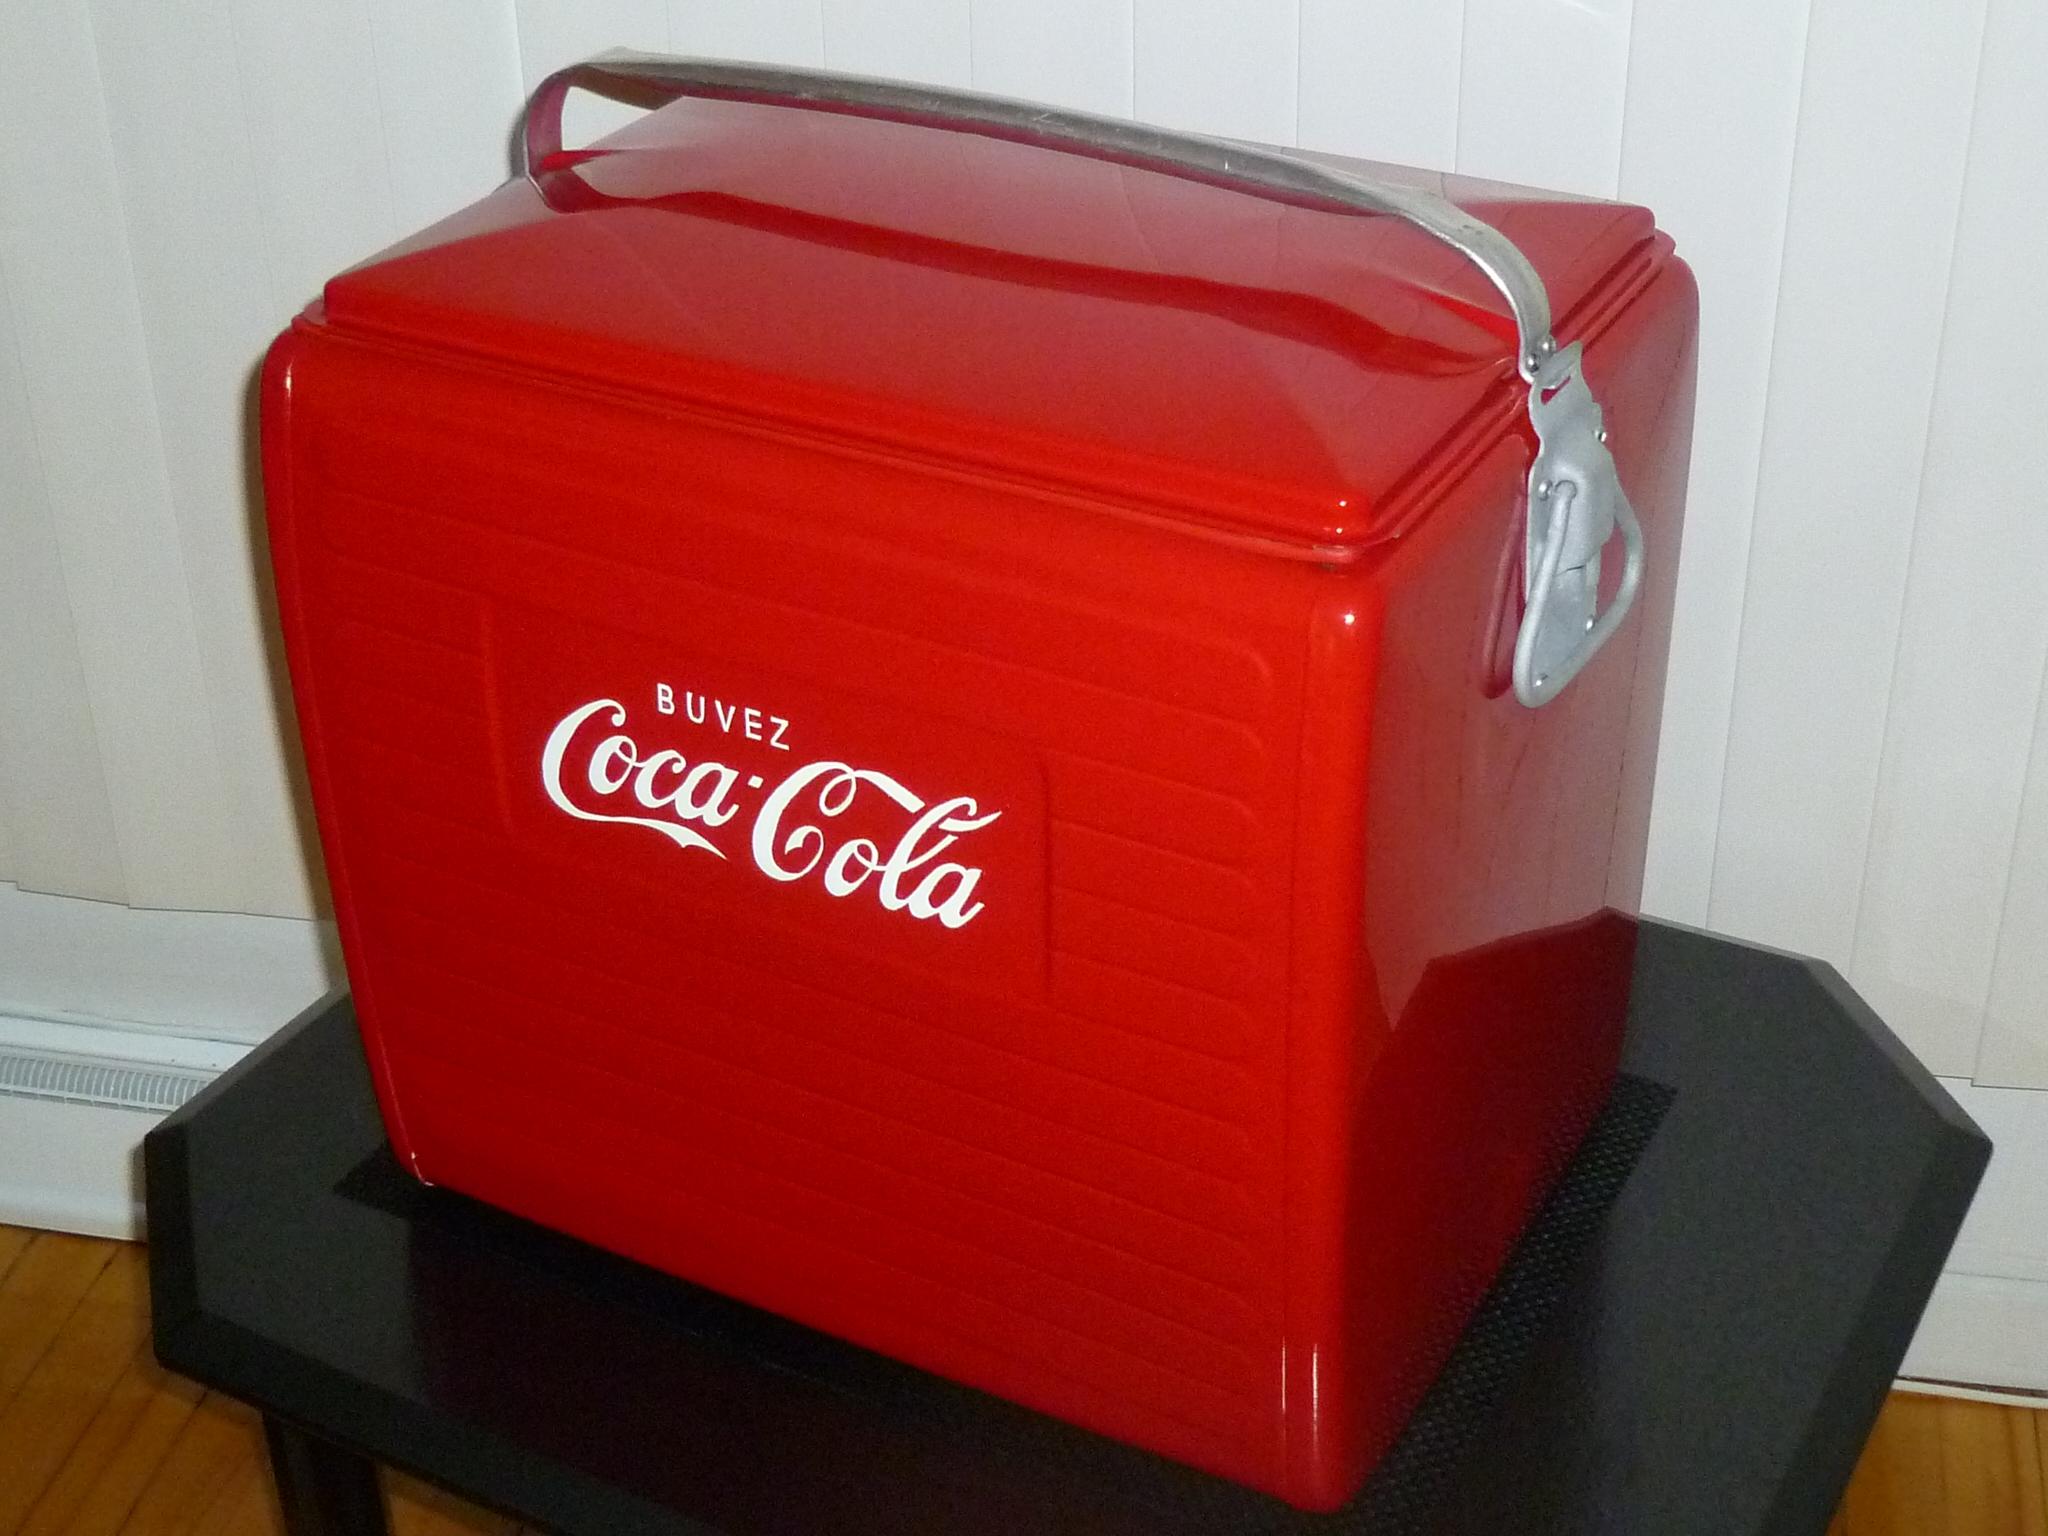 tirage d une glaci re coca cola vintage vasl. Black Bedroom Furniture Sets. Home Design Ideas